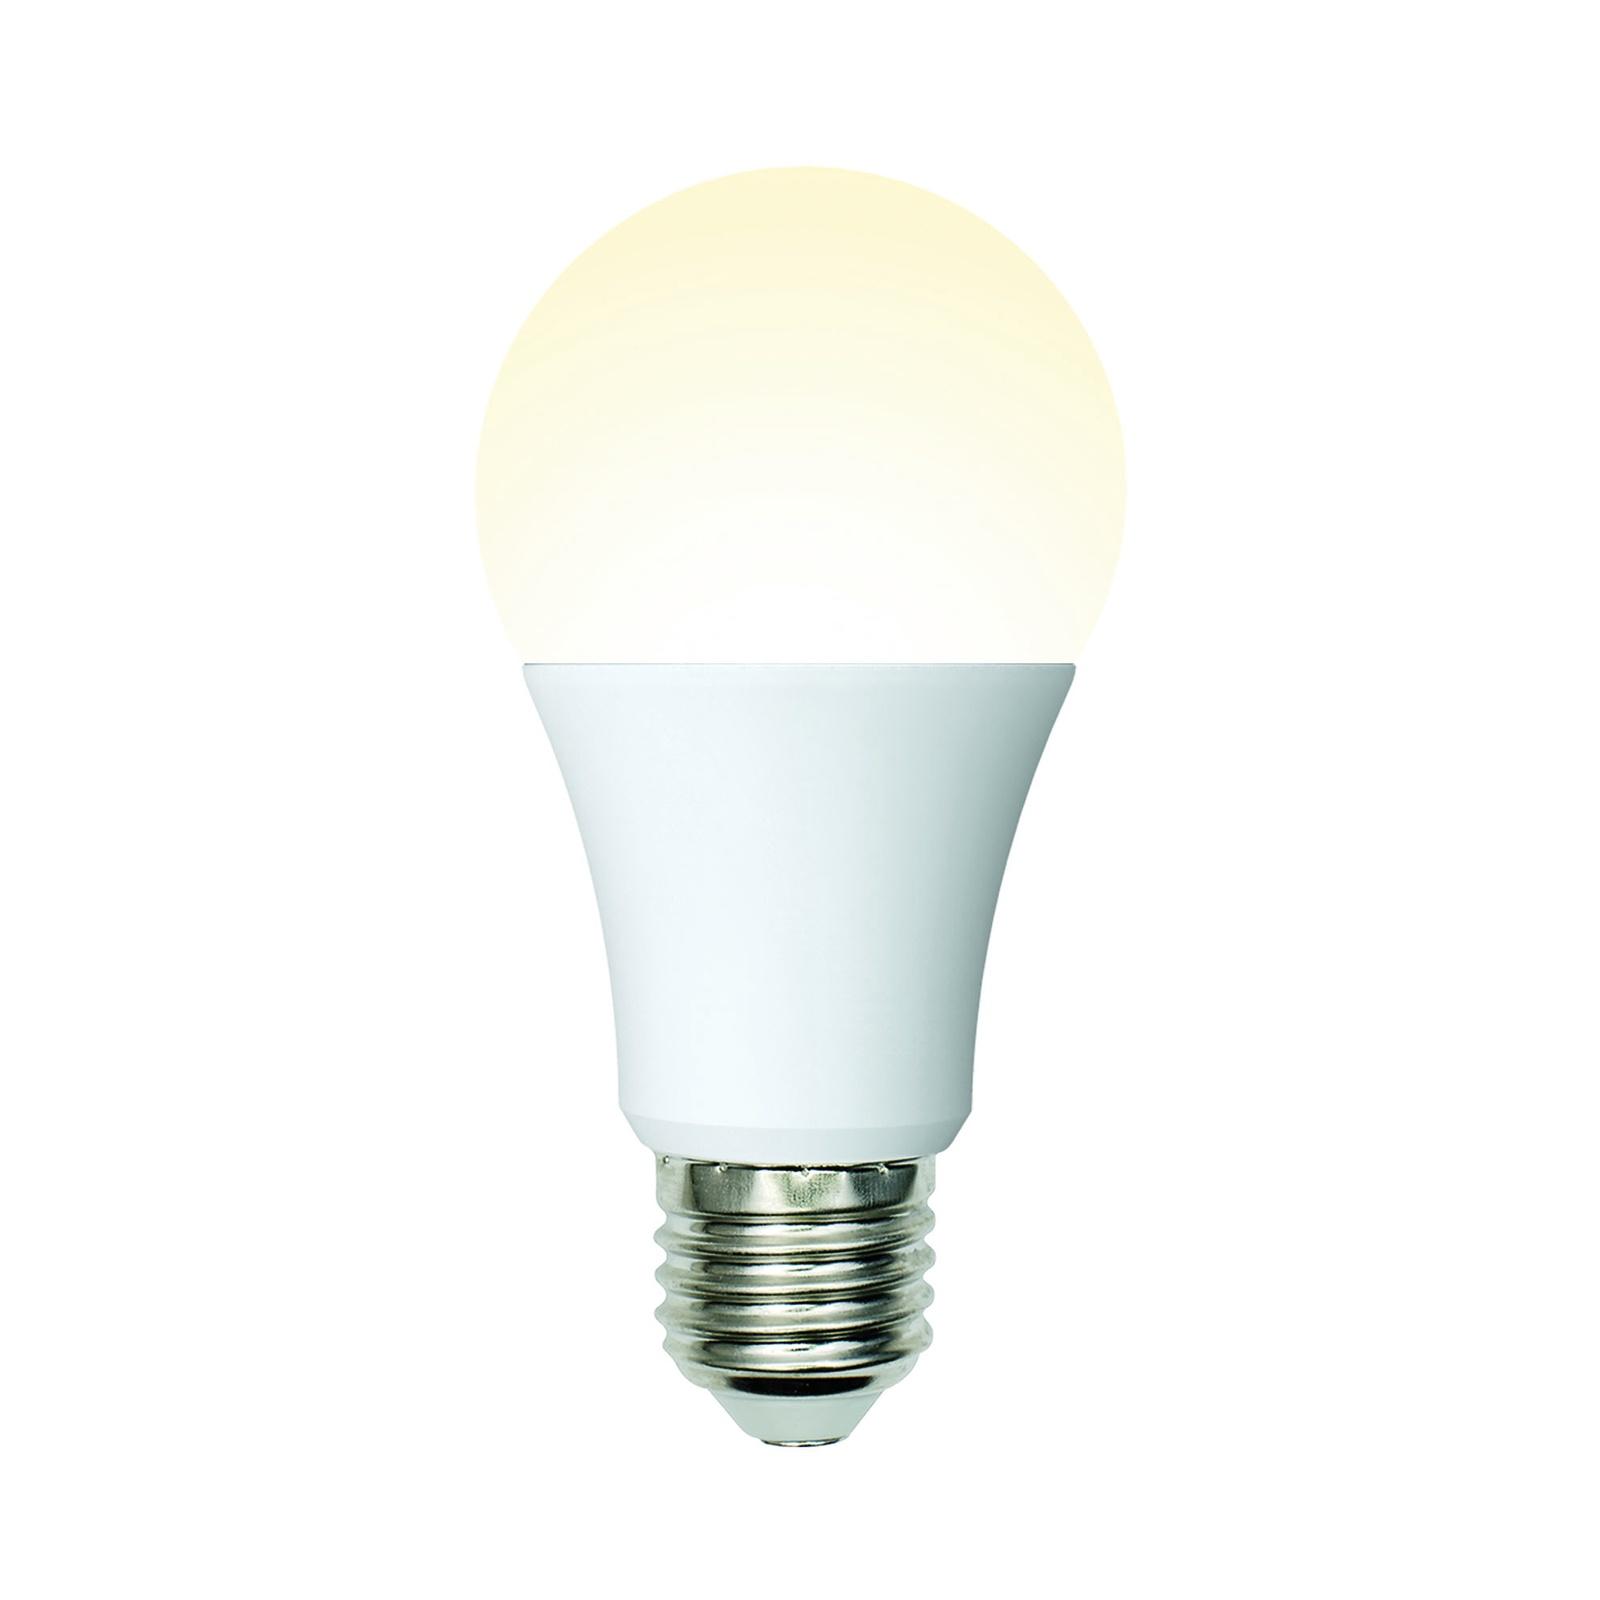 Лампочка Uniel LED-A60-10W/WW/E27/FR/MB 3000K, Теплый свет 10 Вт, Светодиодная